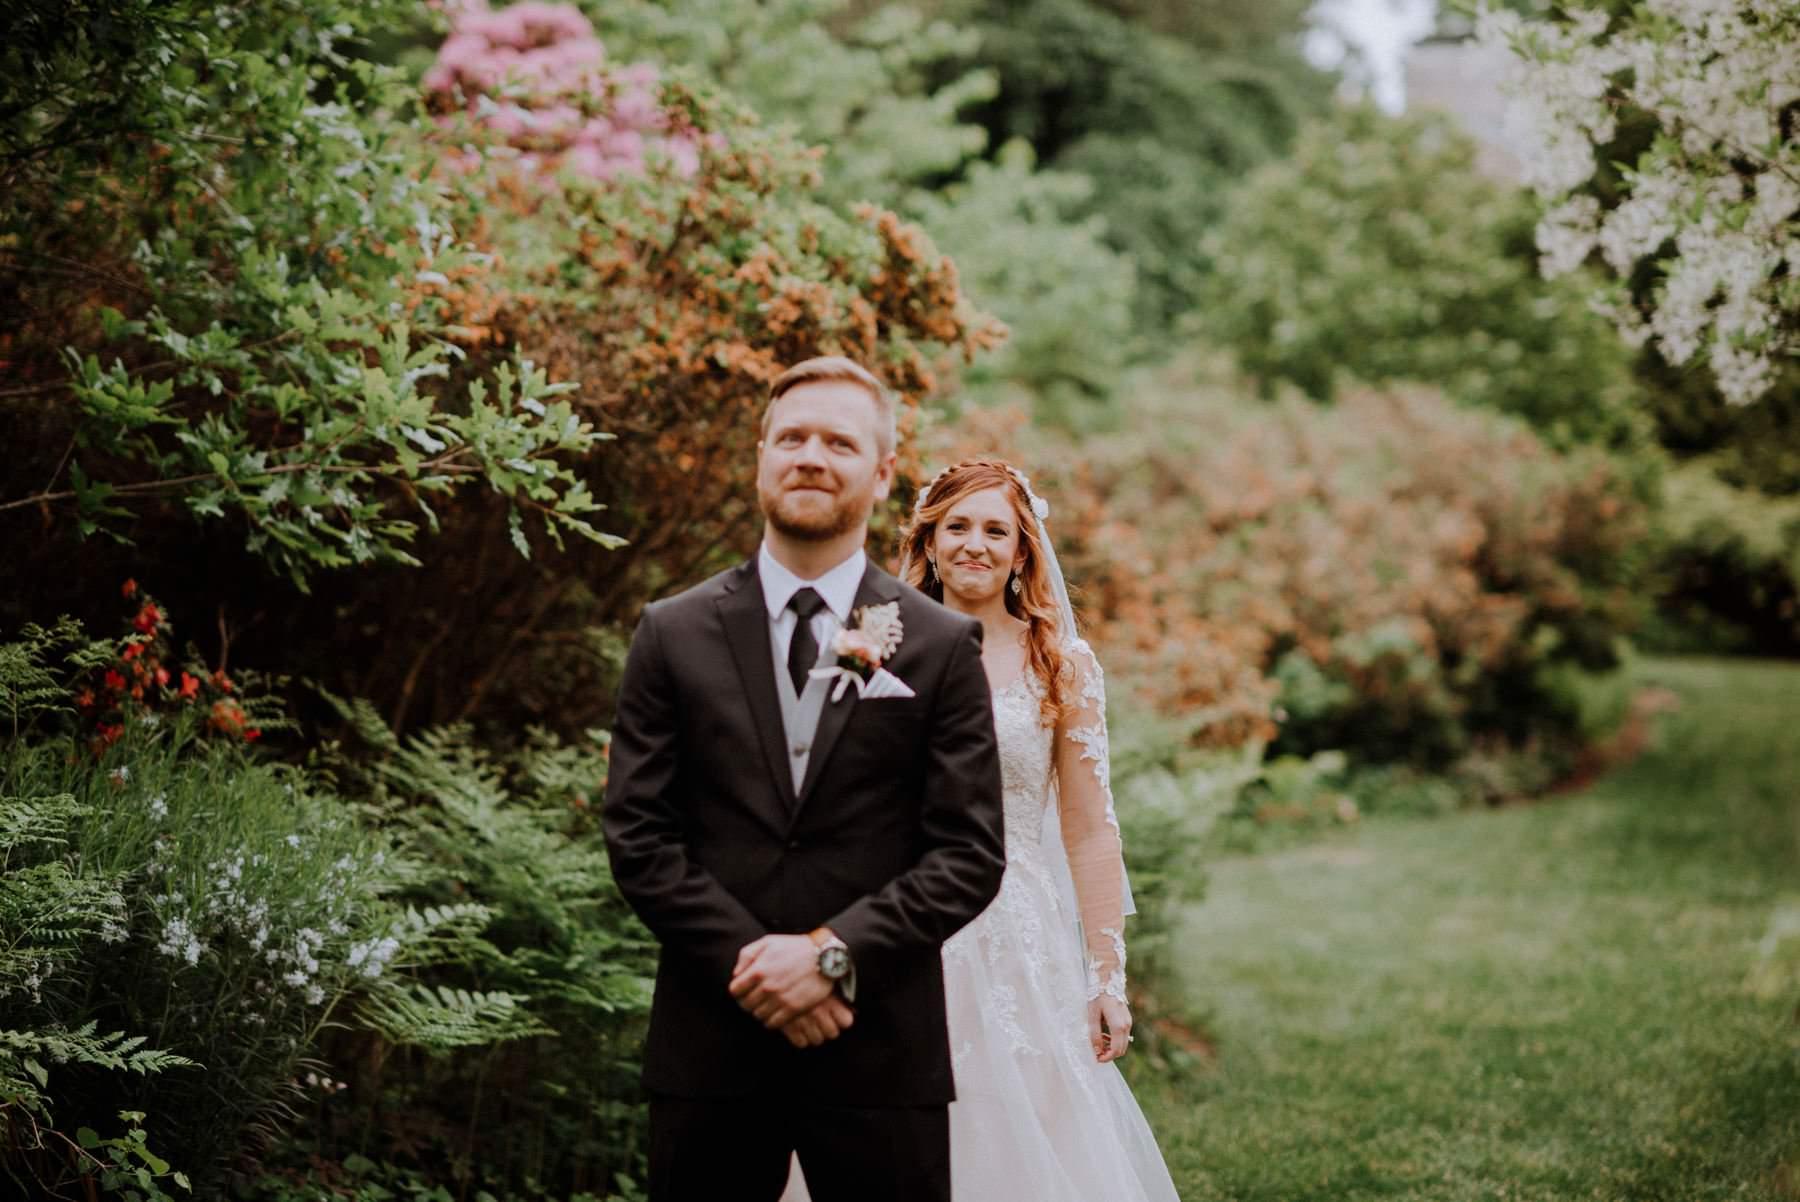 welkinweir-wedding-photography-8.jpg